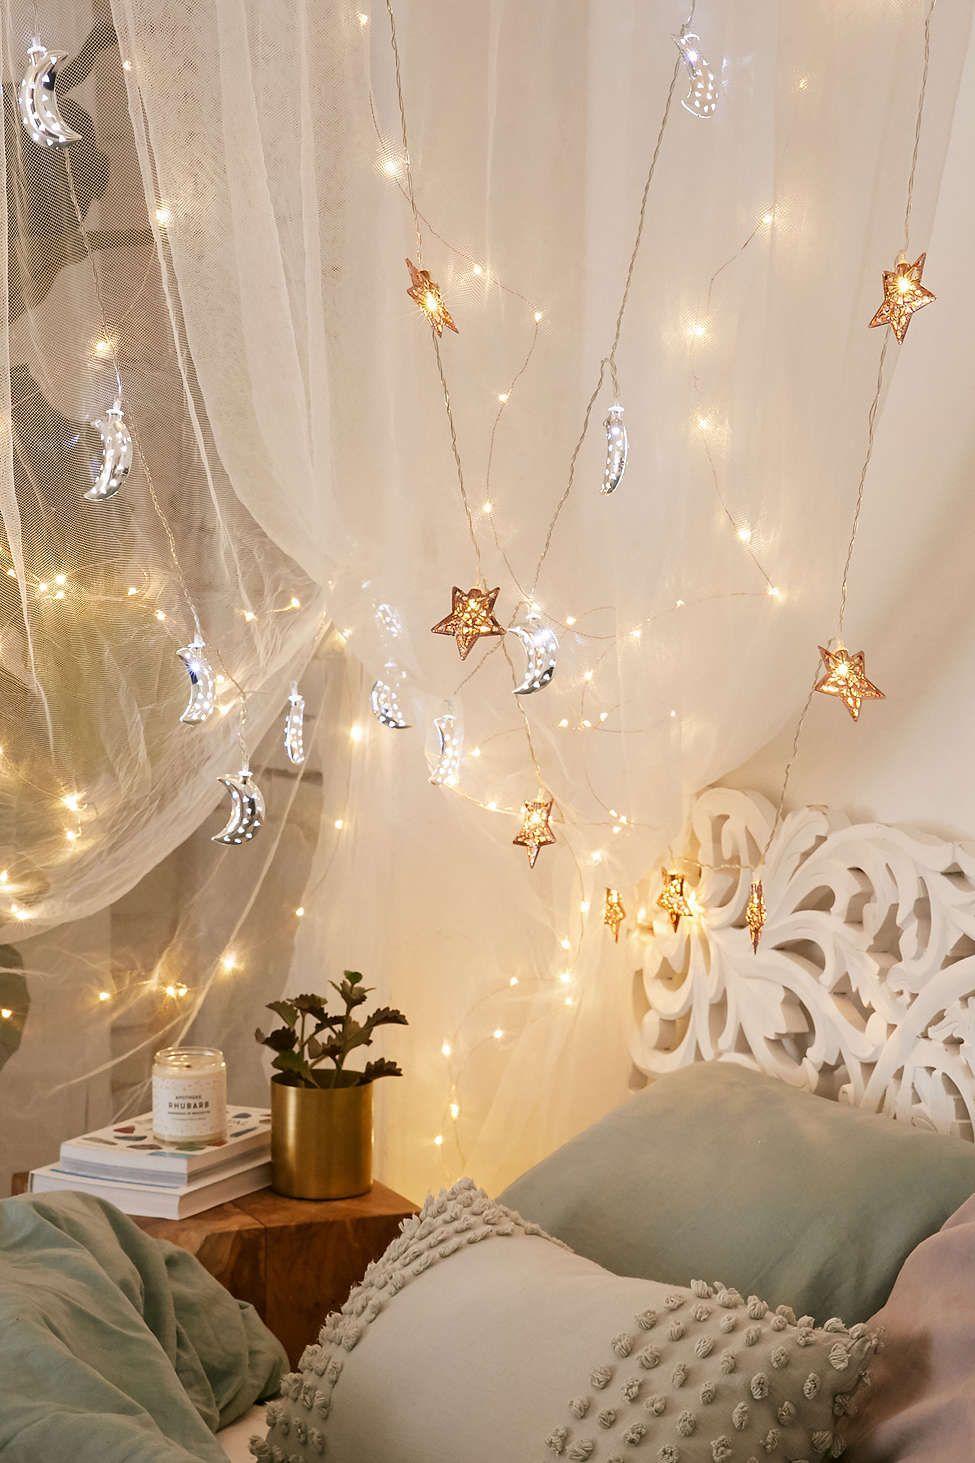 copper star string lights - Decorative String Lights